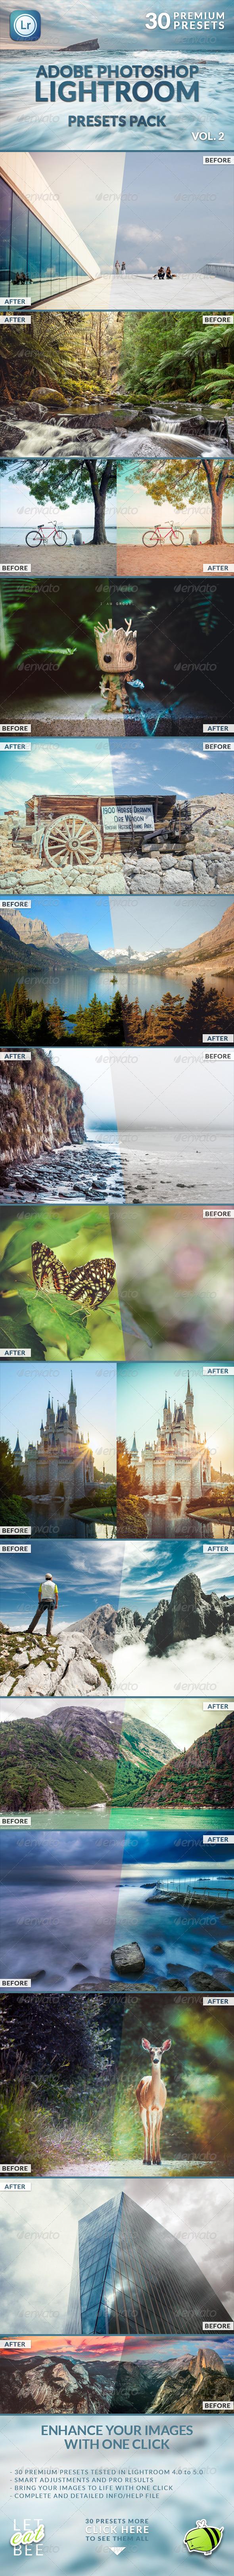 GraphicRiver 30 Premium Lightroom Presets Vol 2 8750901